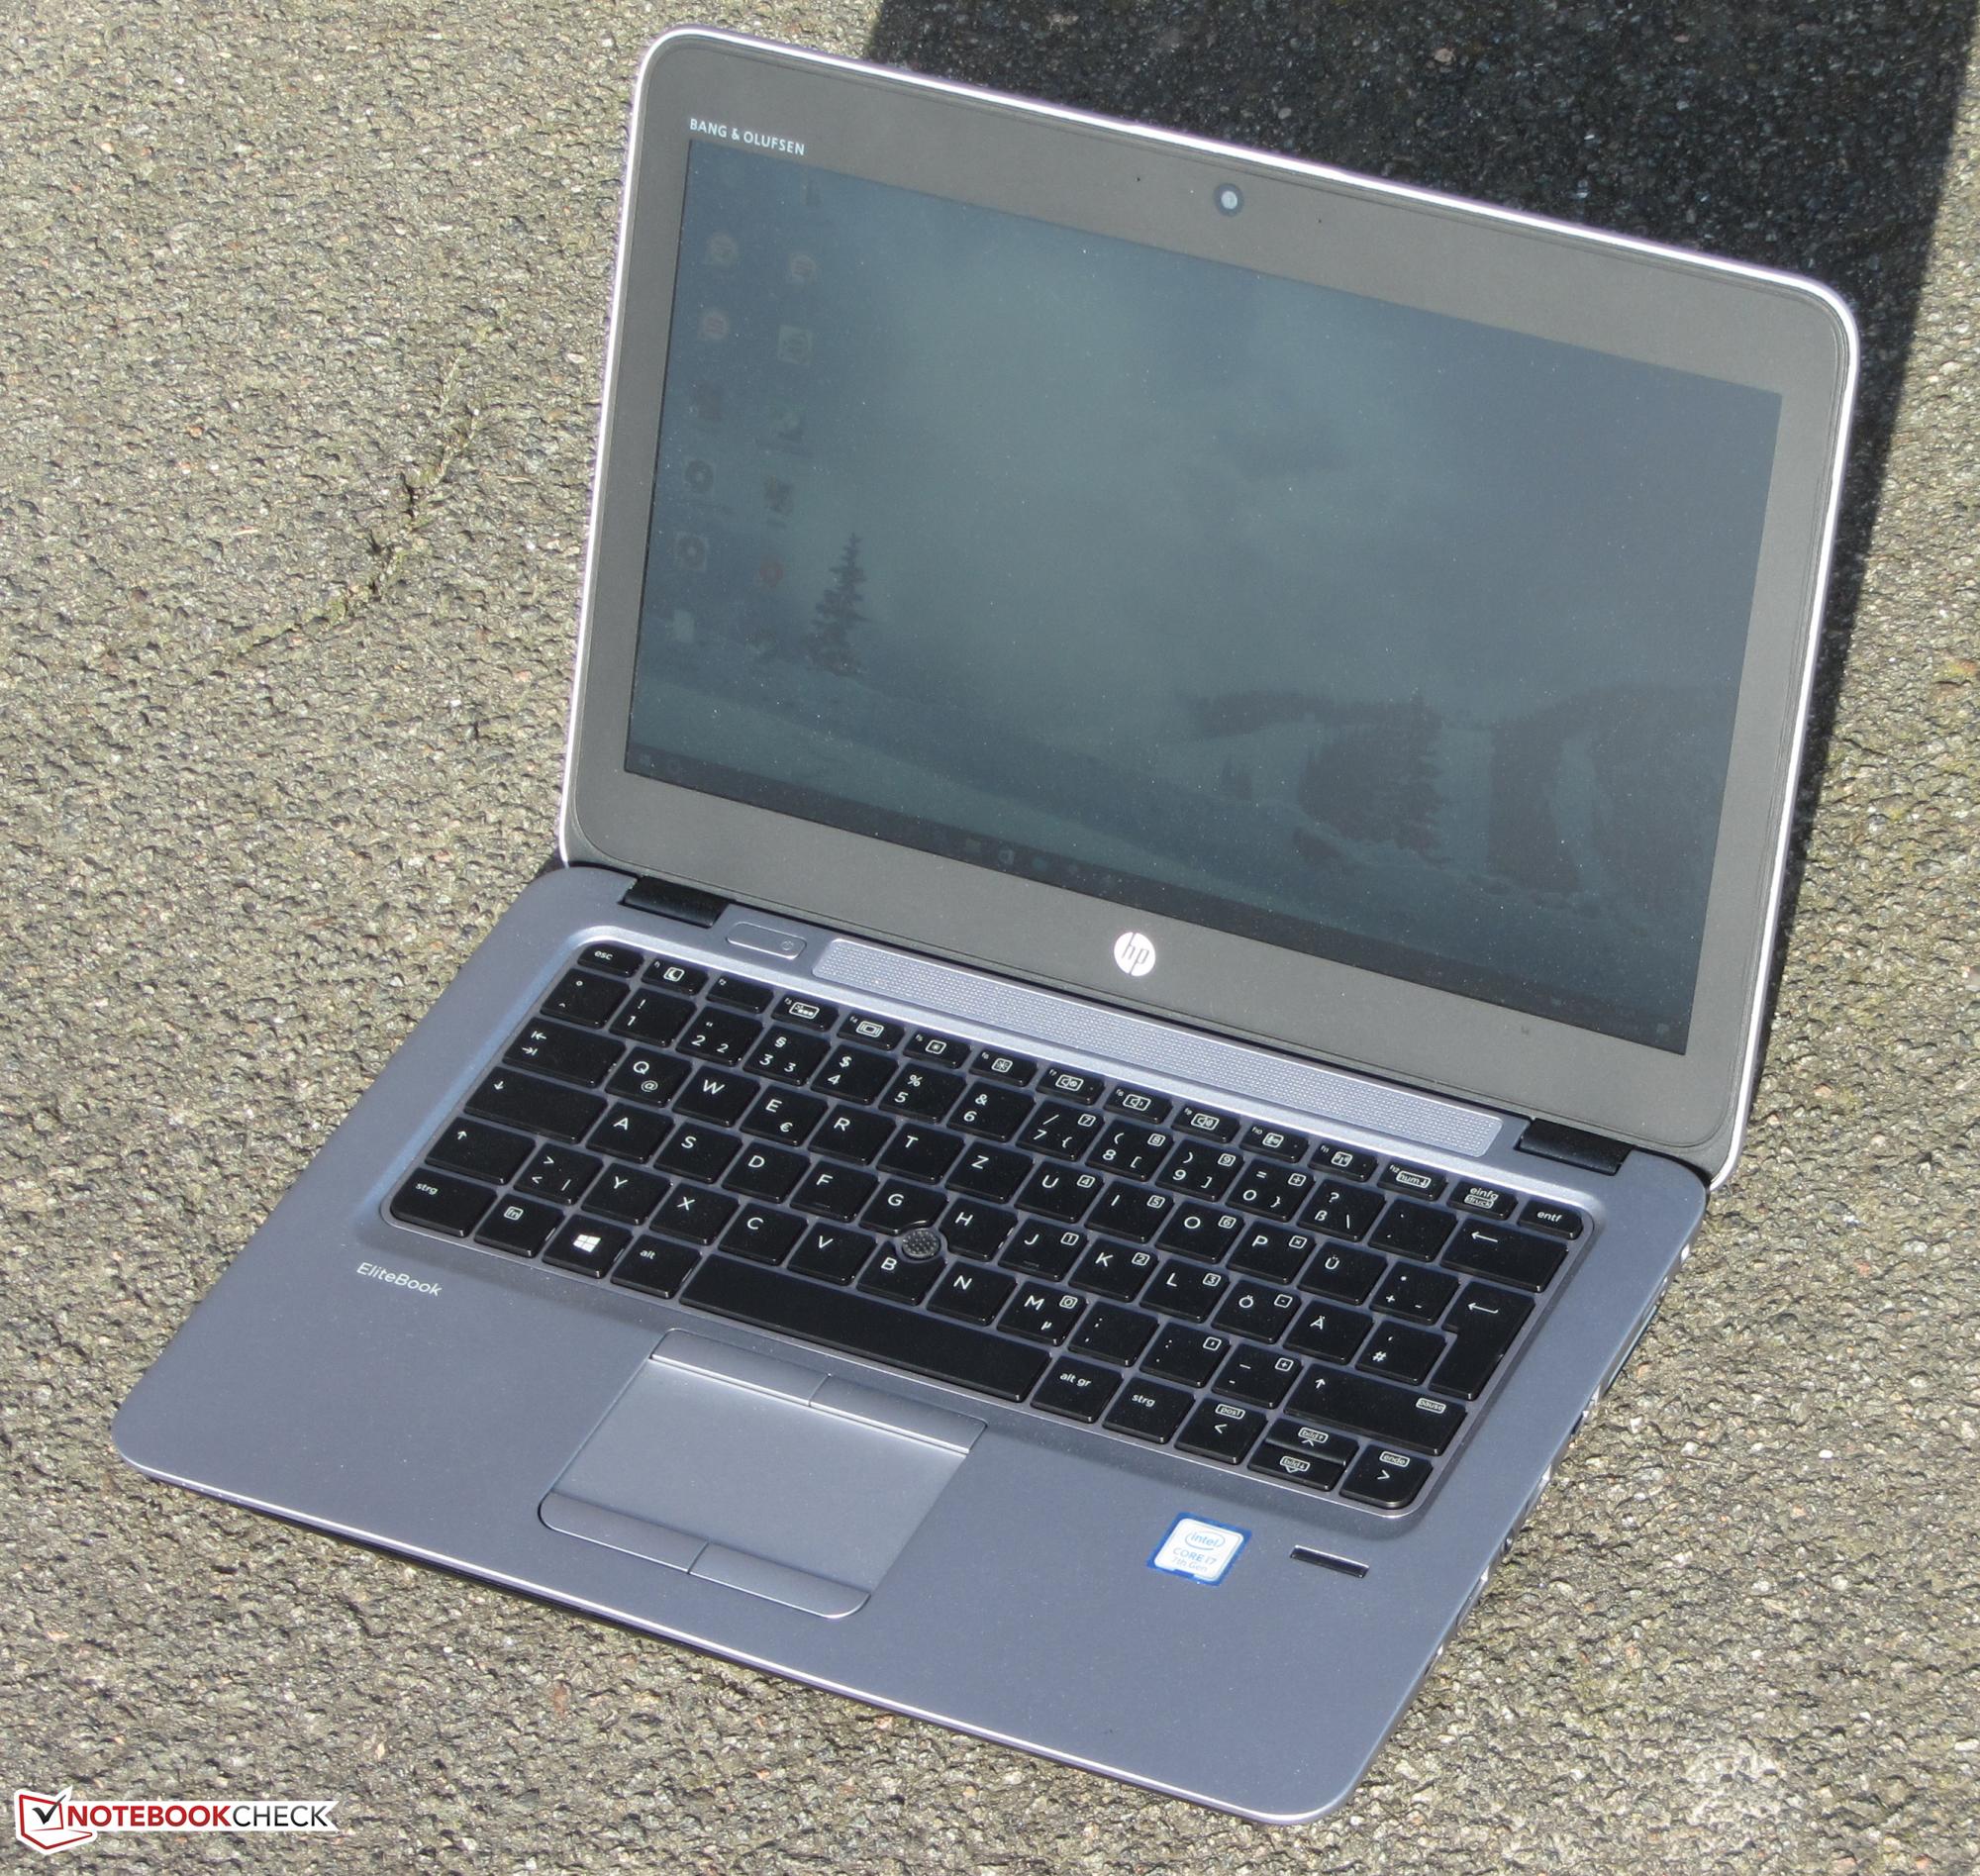 HP EliteBook 820 G4 (7500U, Full HD) Notebook Review - NotebookCheck